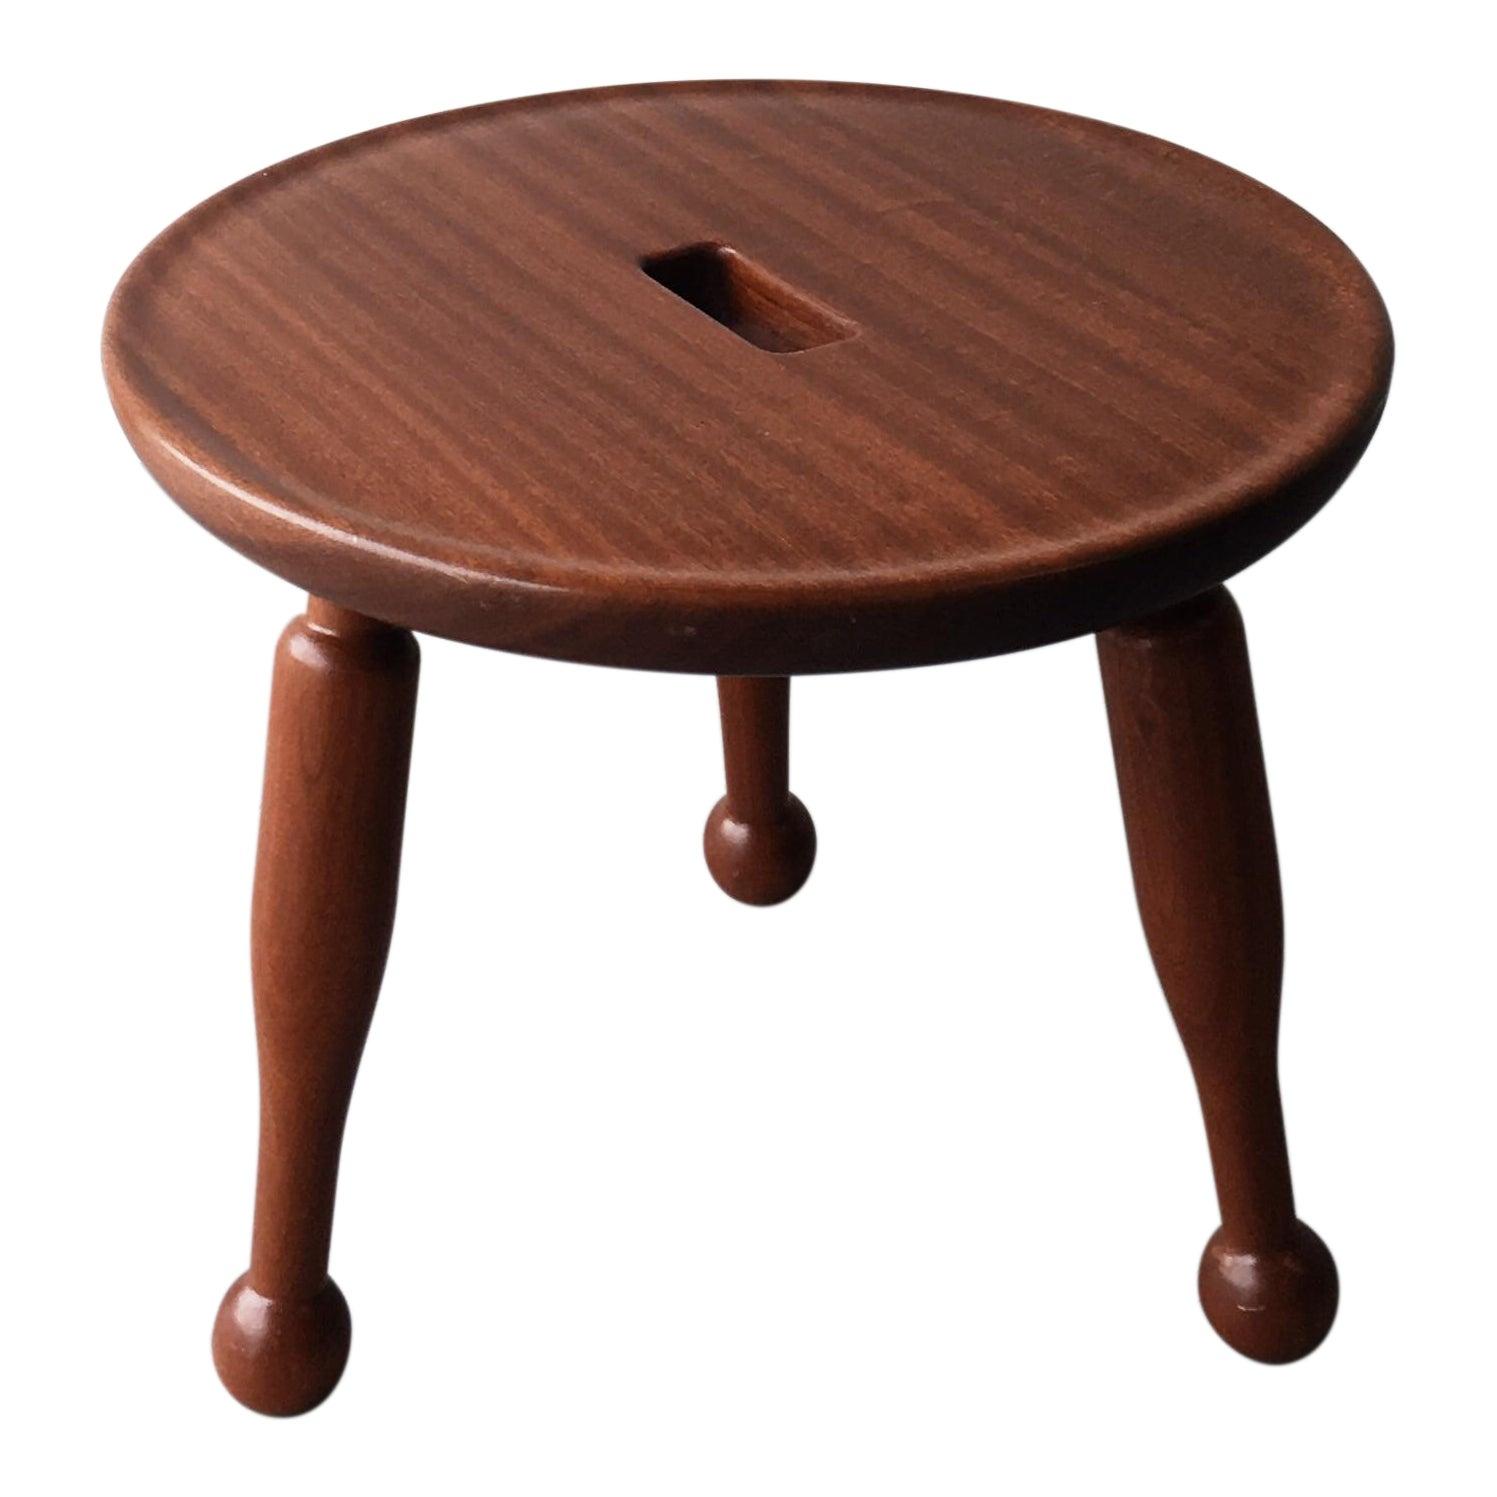 Low Vintage Teak Side Table